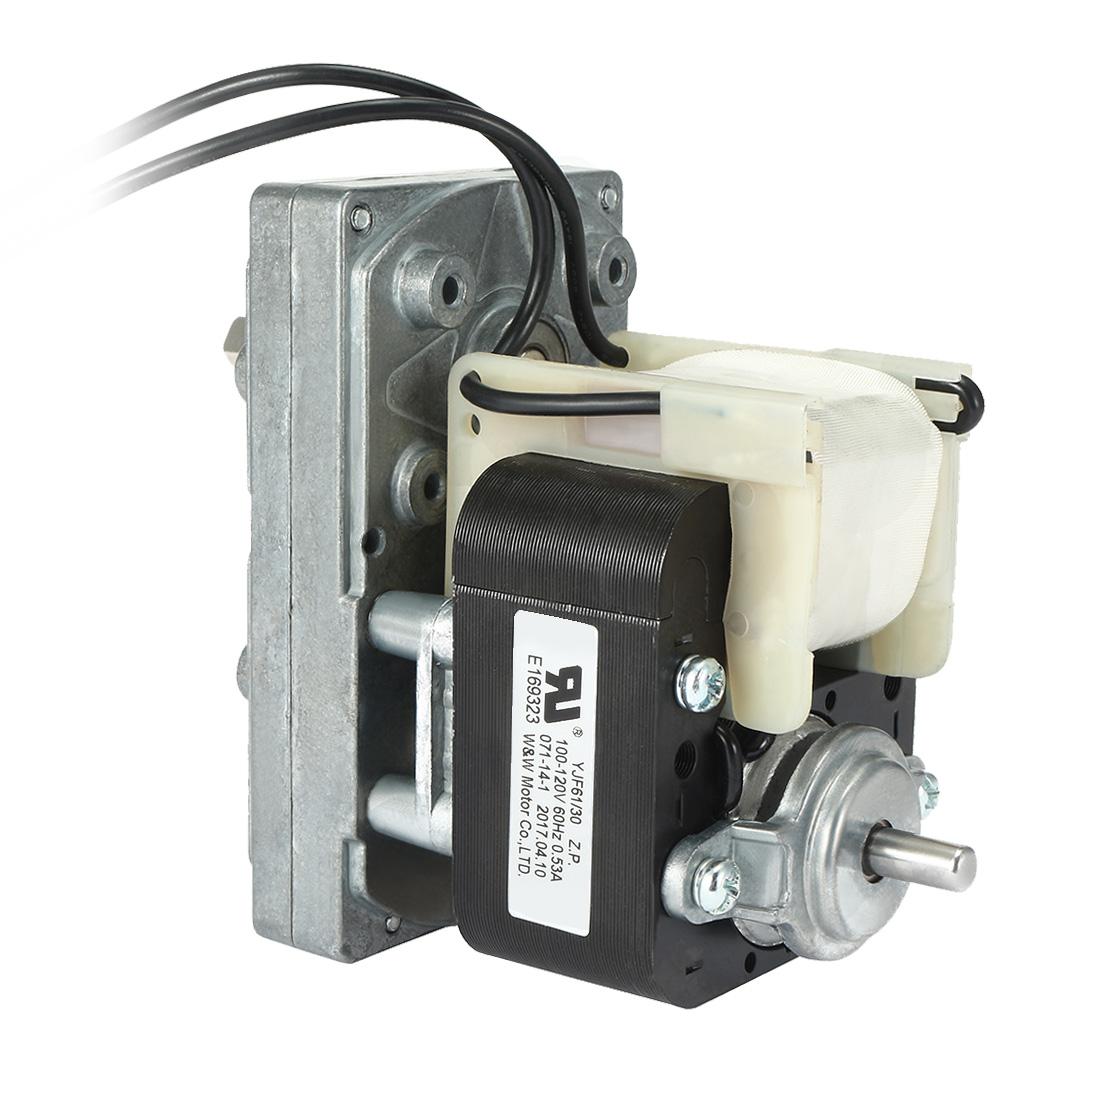 FC-YJ61 AC100V-120V 60Hz 16RPM CCW Shaded Pole Motor Universal Geared Motor